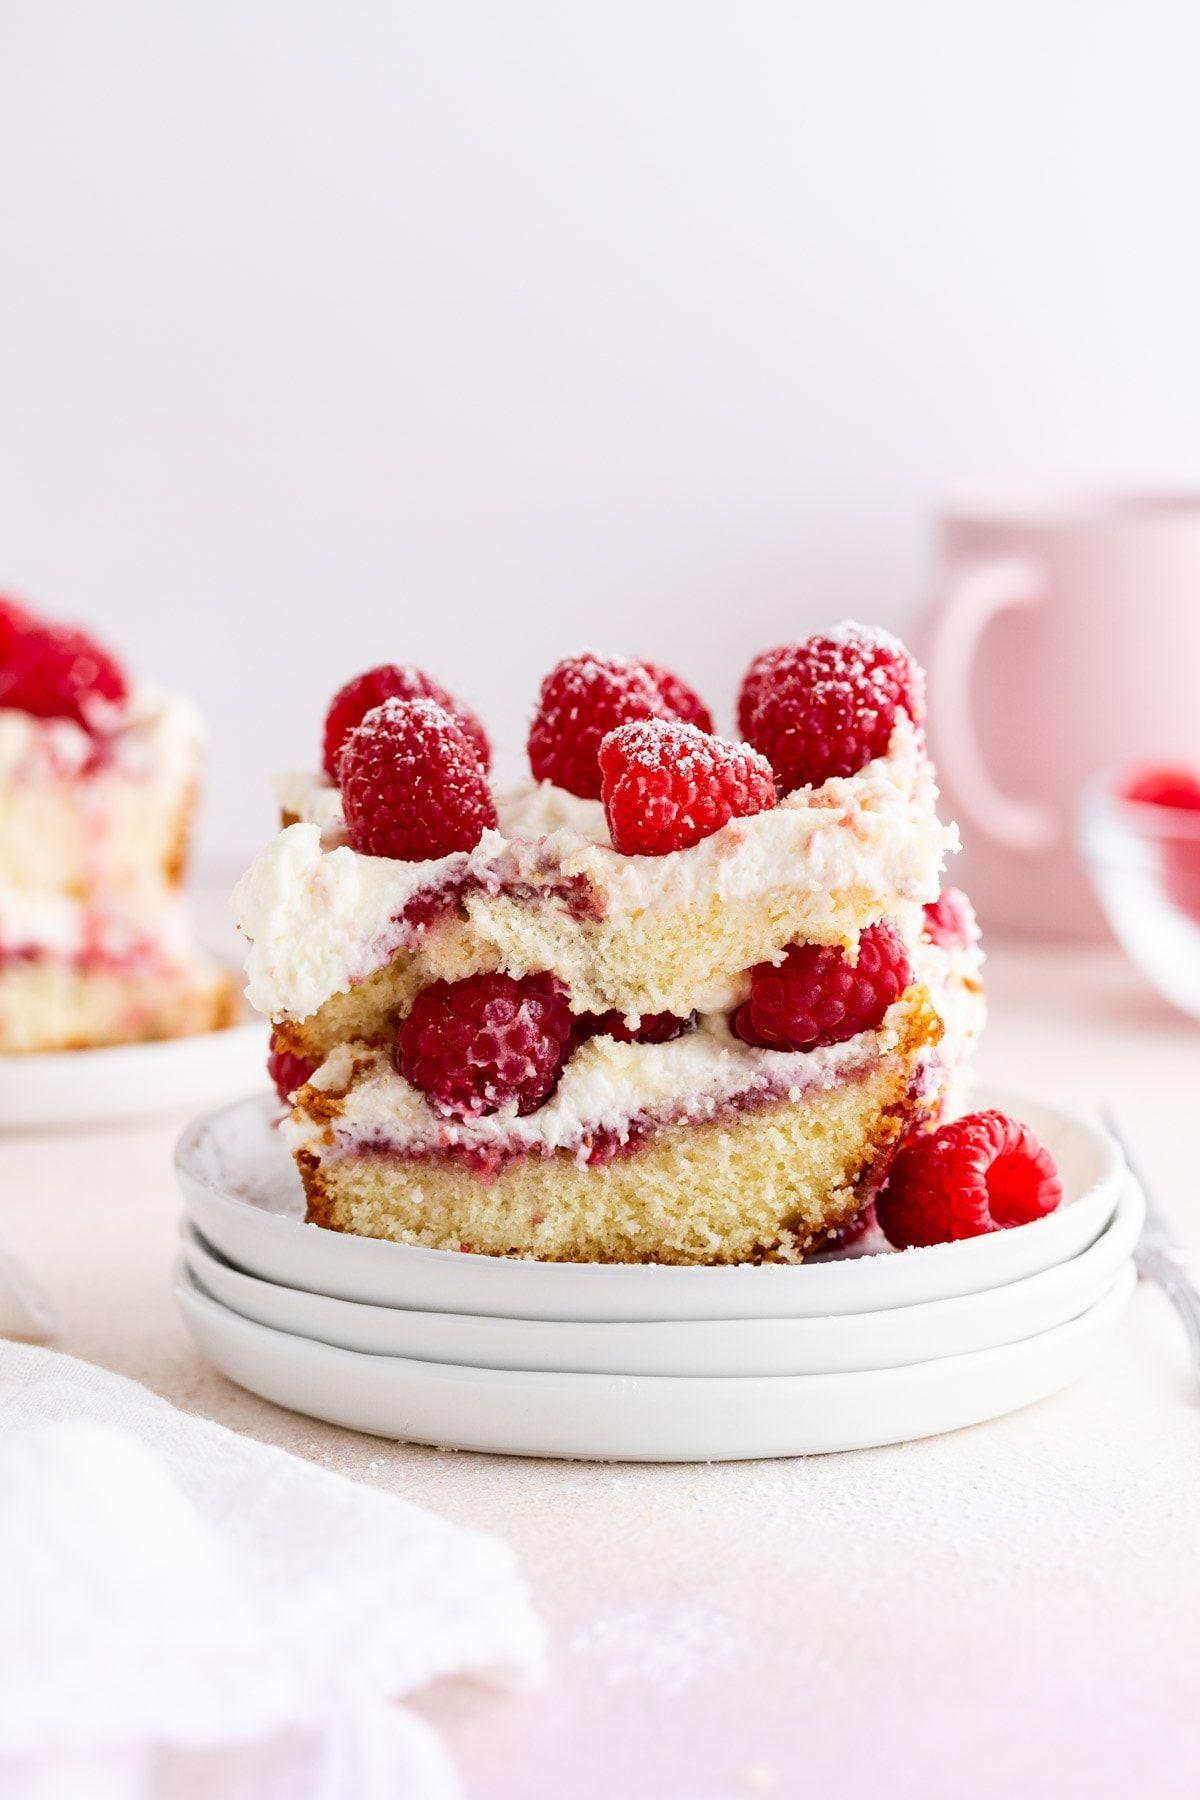 Raspberry Pound Cake Tiramisu Recipe Girl Vs Dough In 2020 Raspberry Recipes Dessert Tiramisu Recipe Dessert Recipes